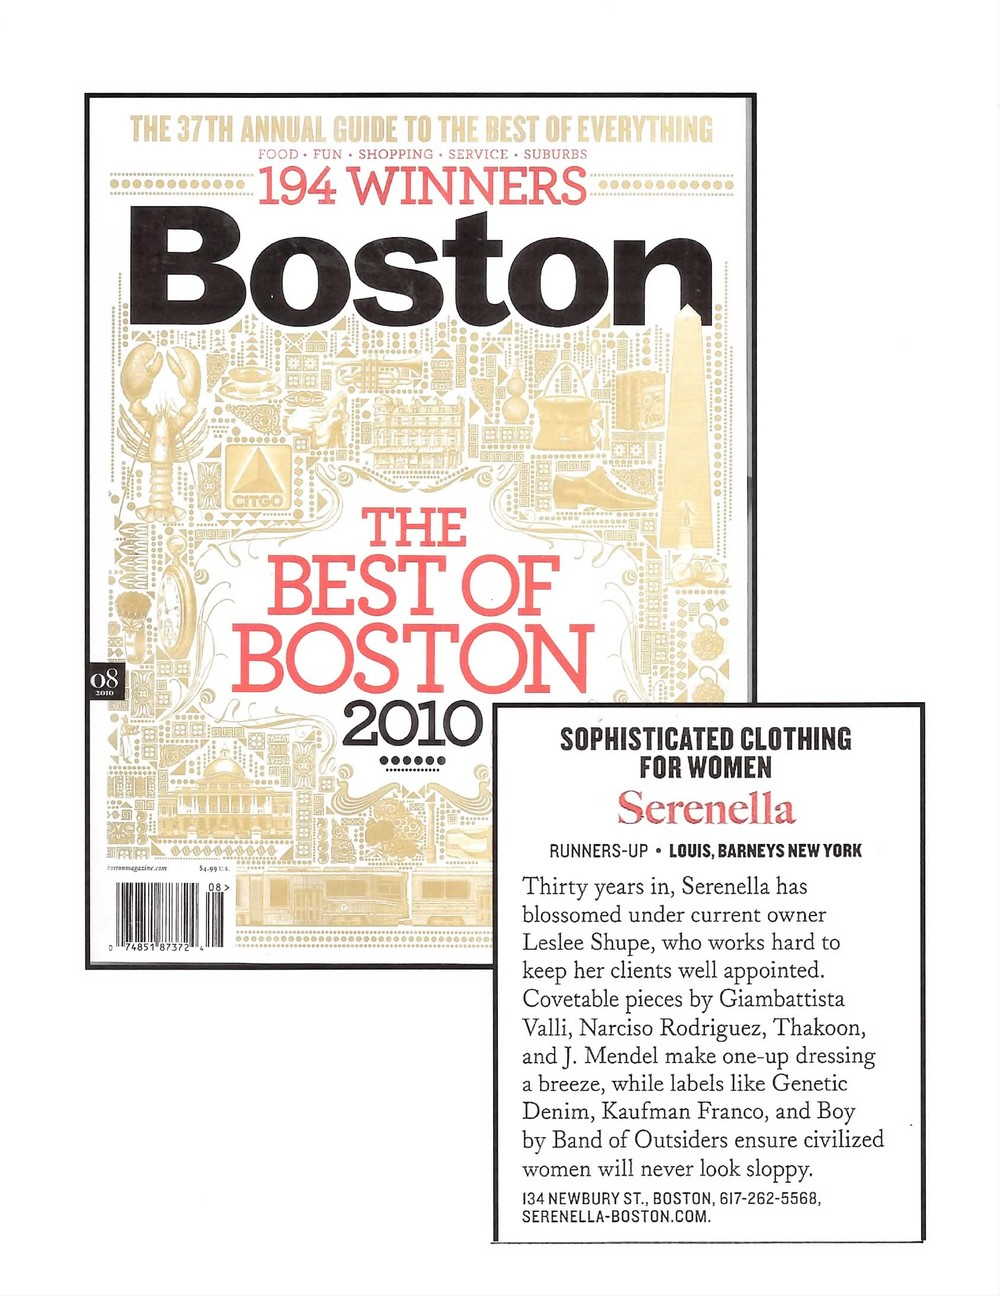 EST OF BOSTON BOSOTN MAGAZINE - 2010